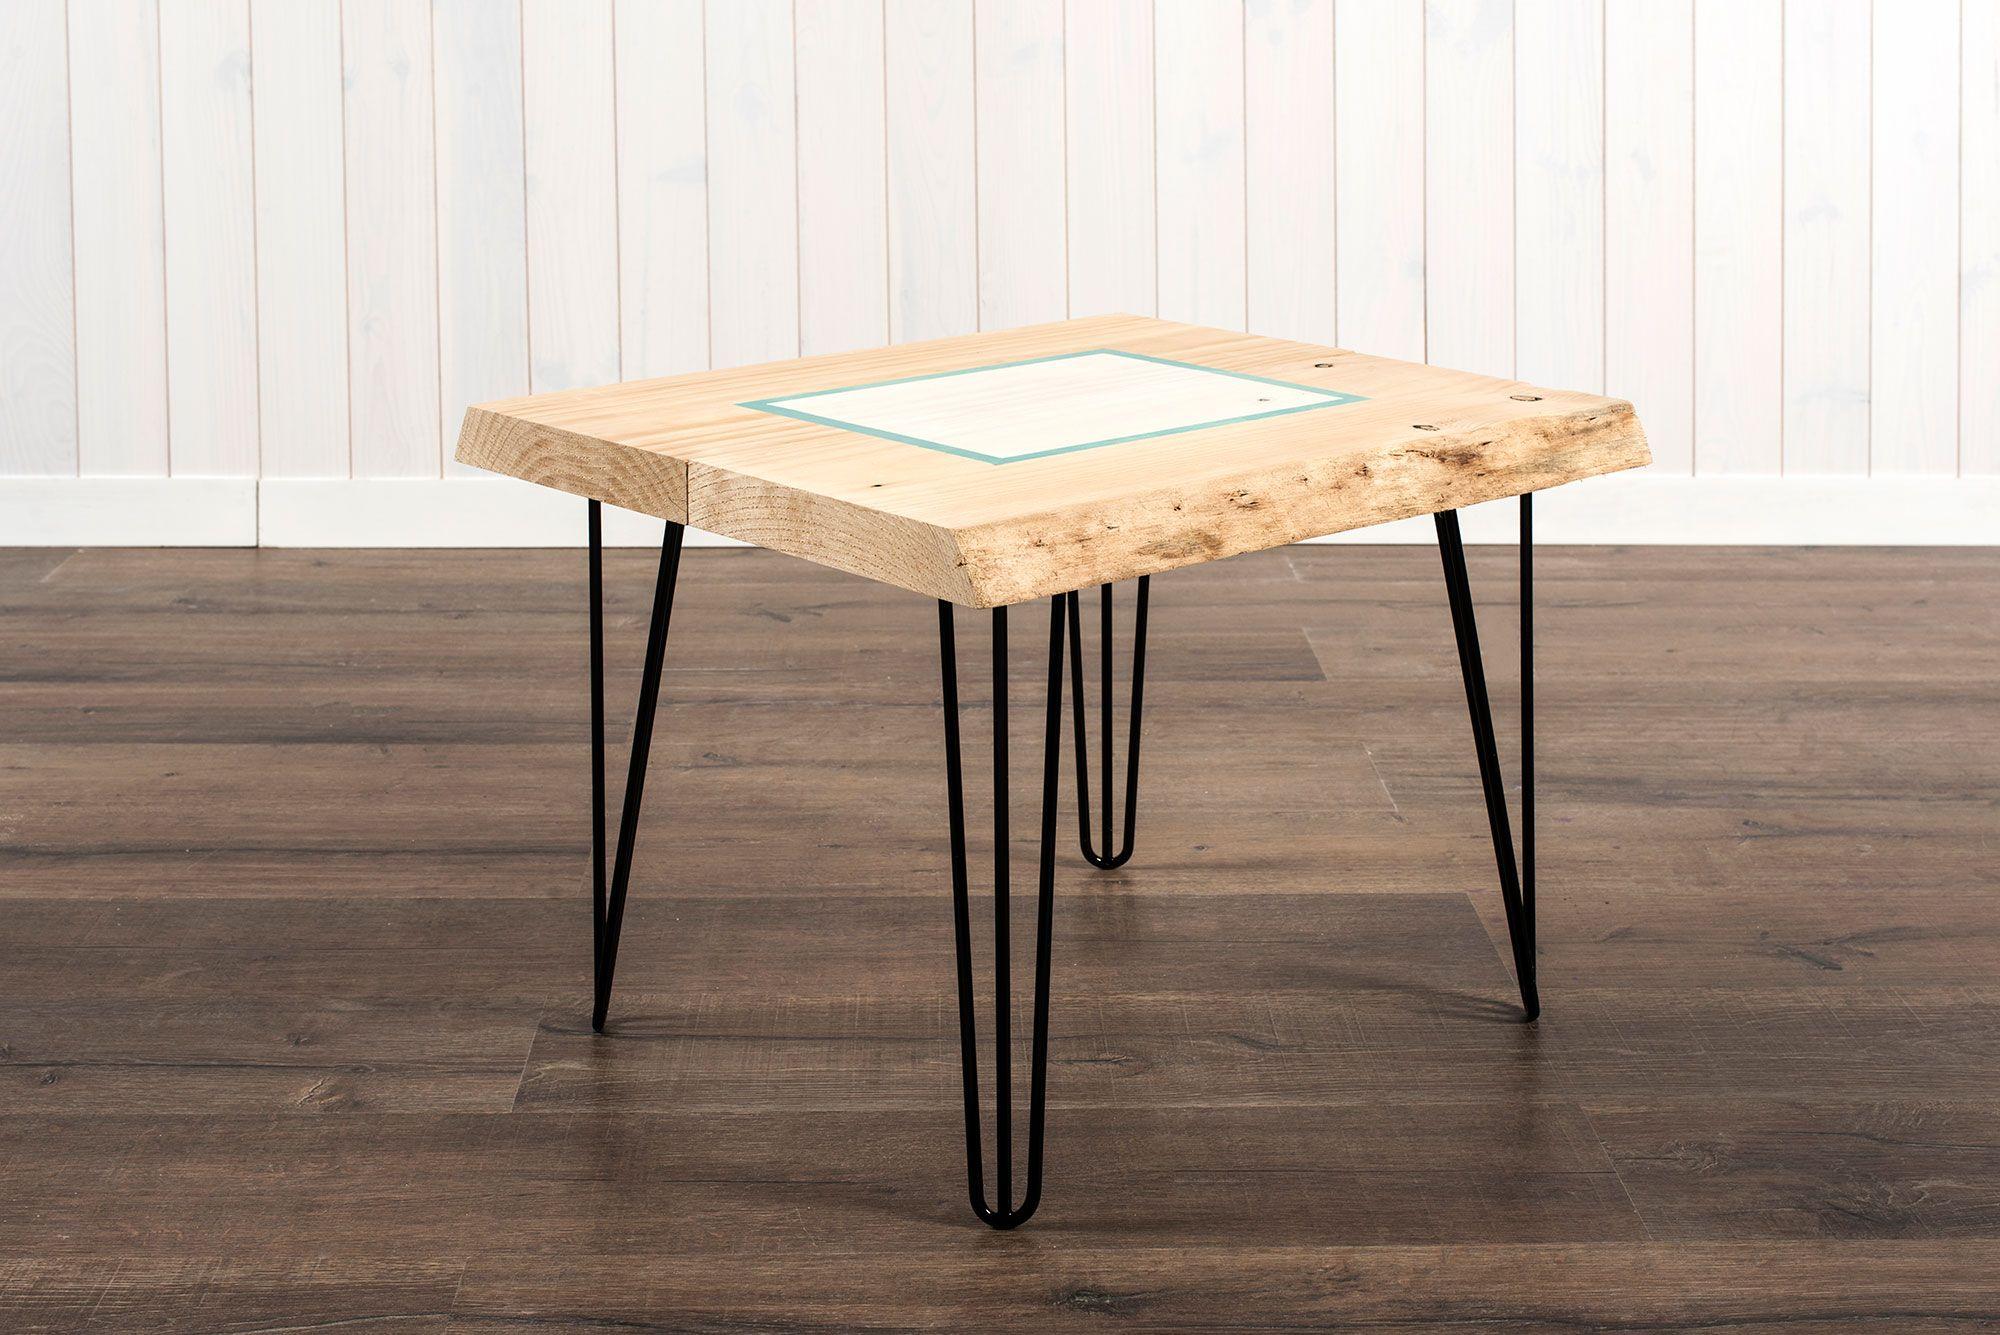 7 ideas para construir muebles de madera maciza